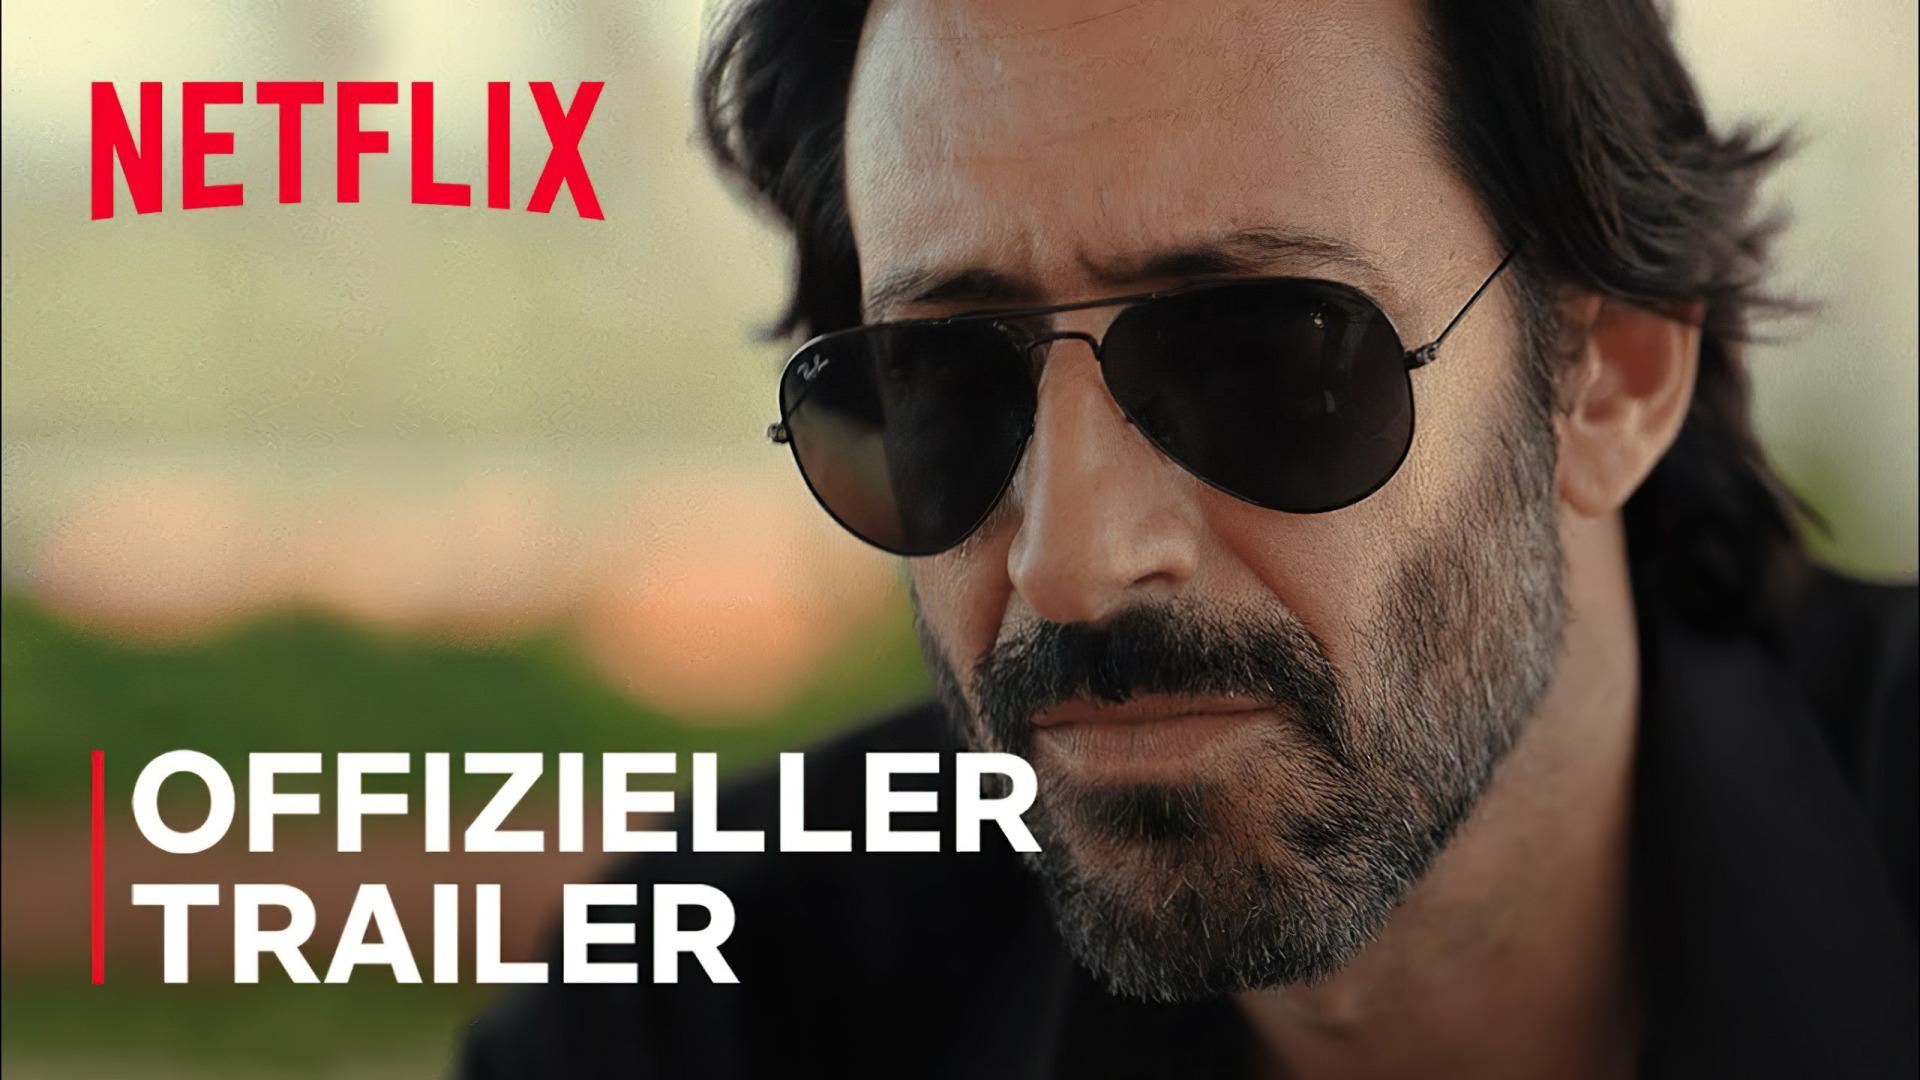 Trailer, Netflix, Serie, Narcos, Narcos: Mexico